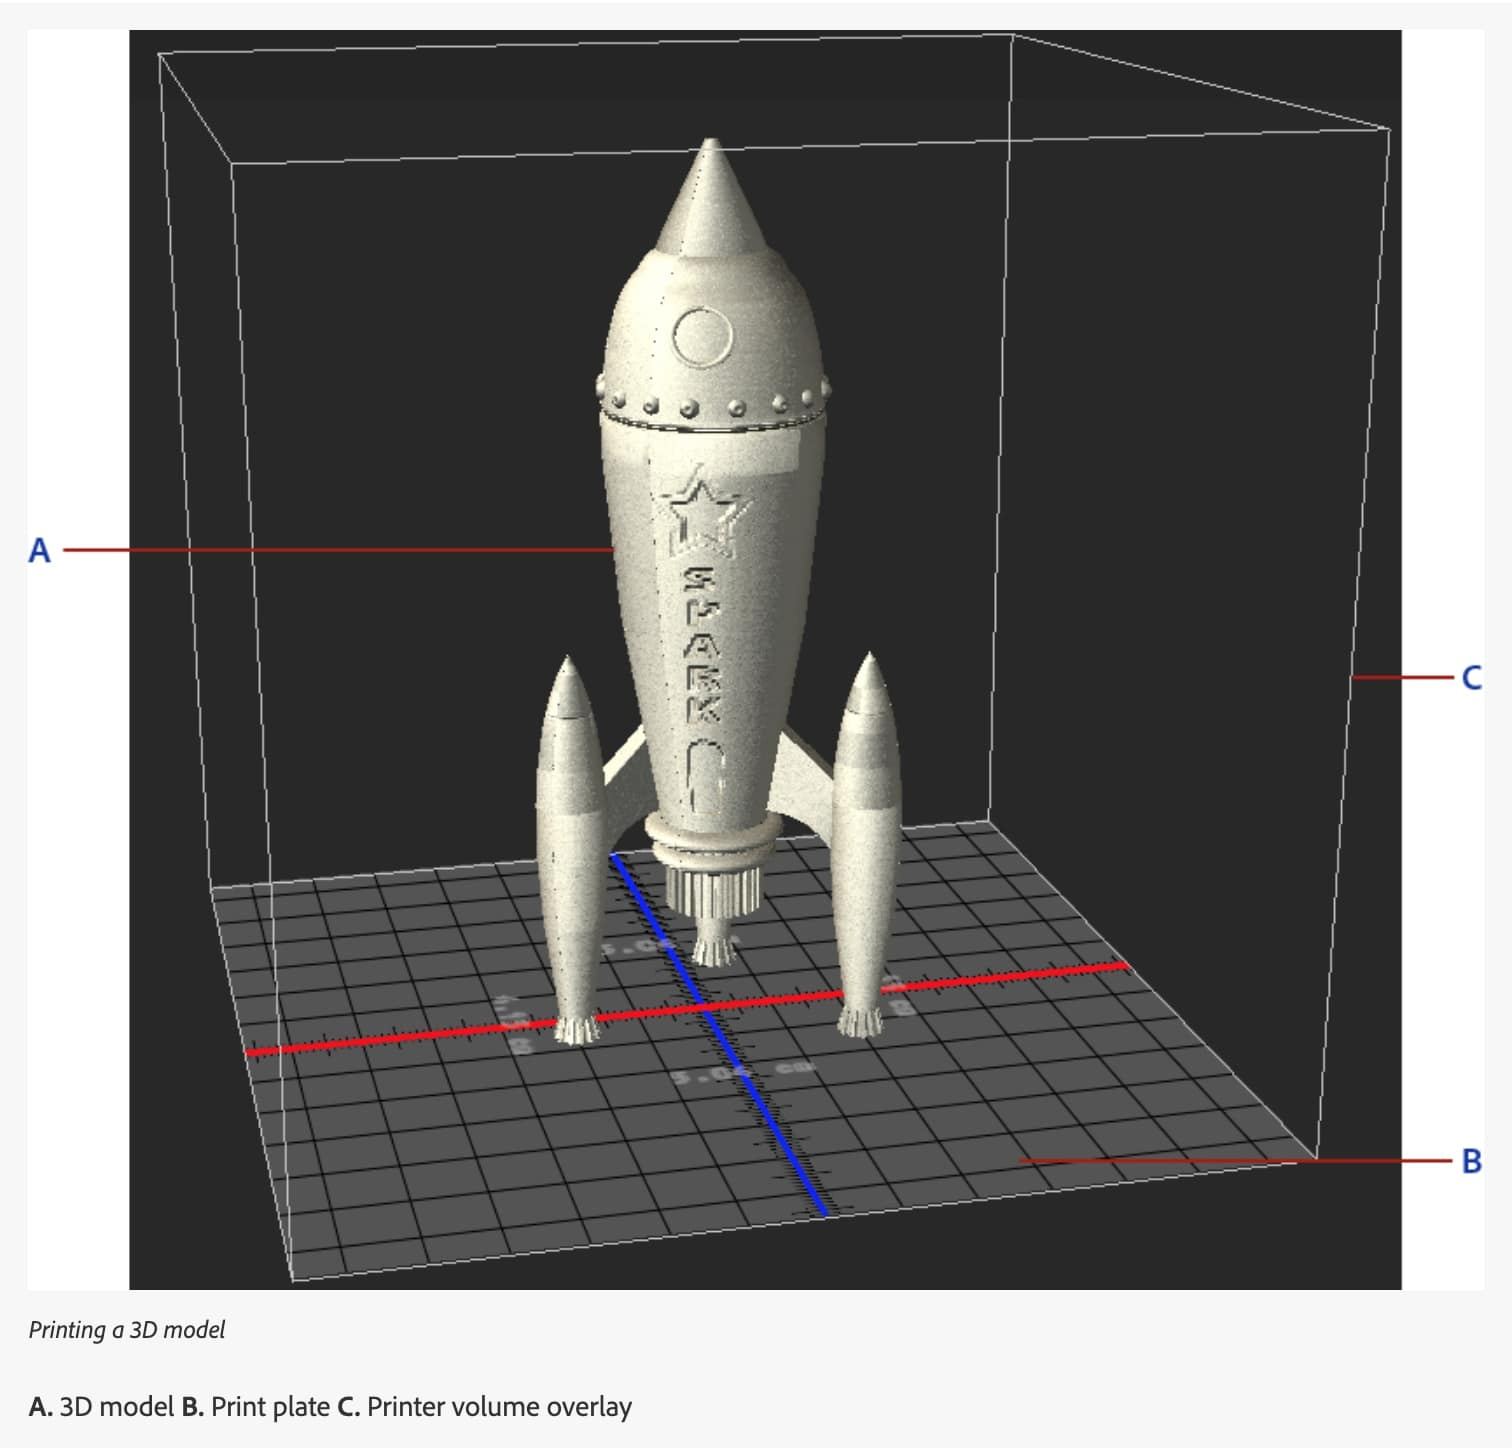 Photoshop CC Print 3D Objects